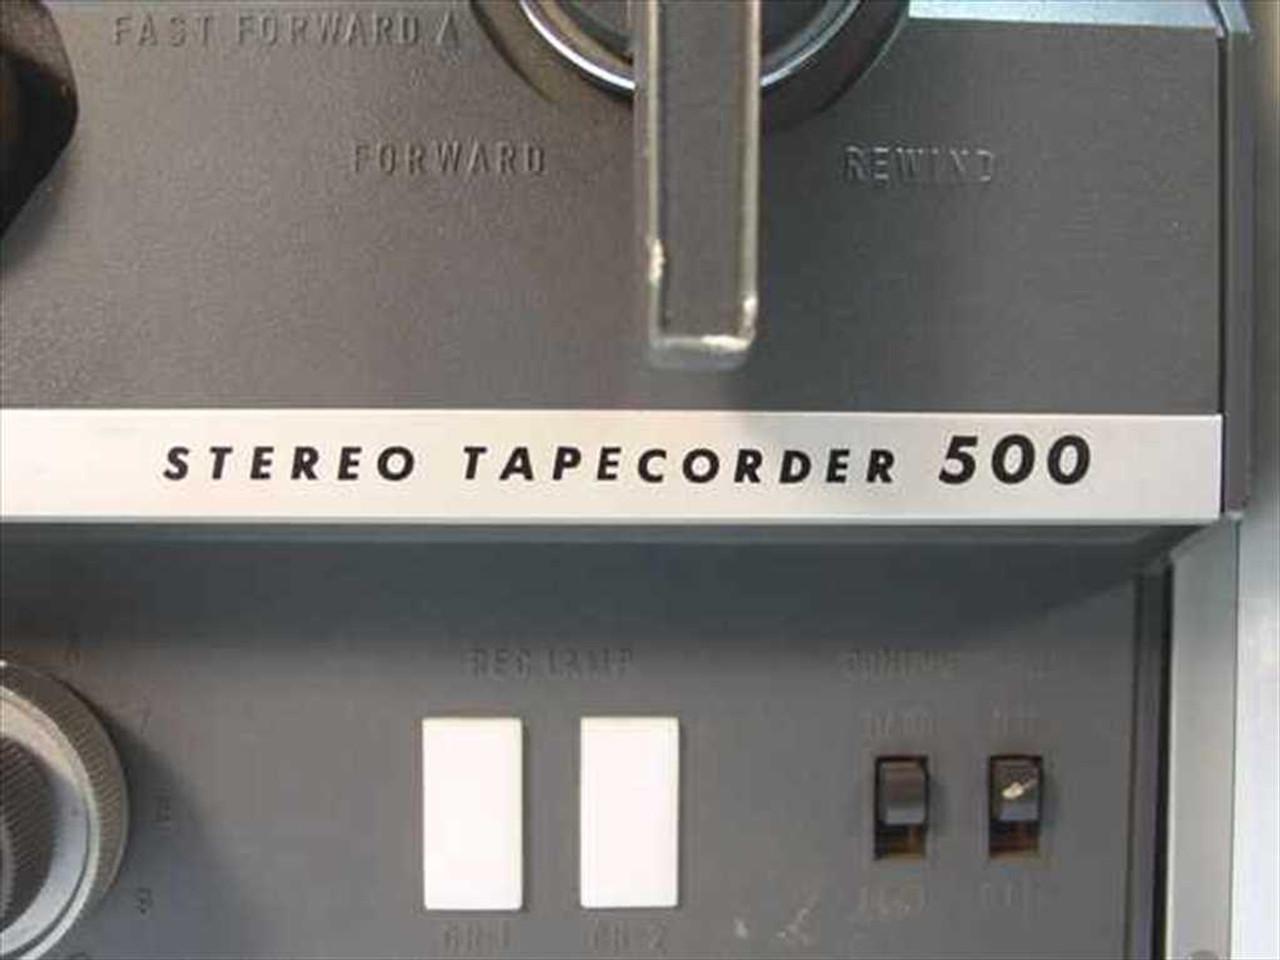 "... Sony TC-500 1/4"" Reel to Reel Tapecorder ..."